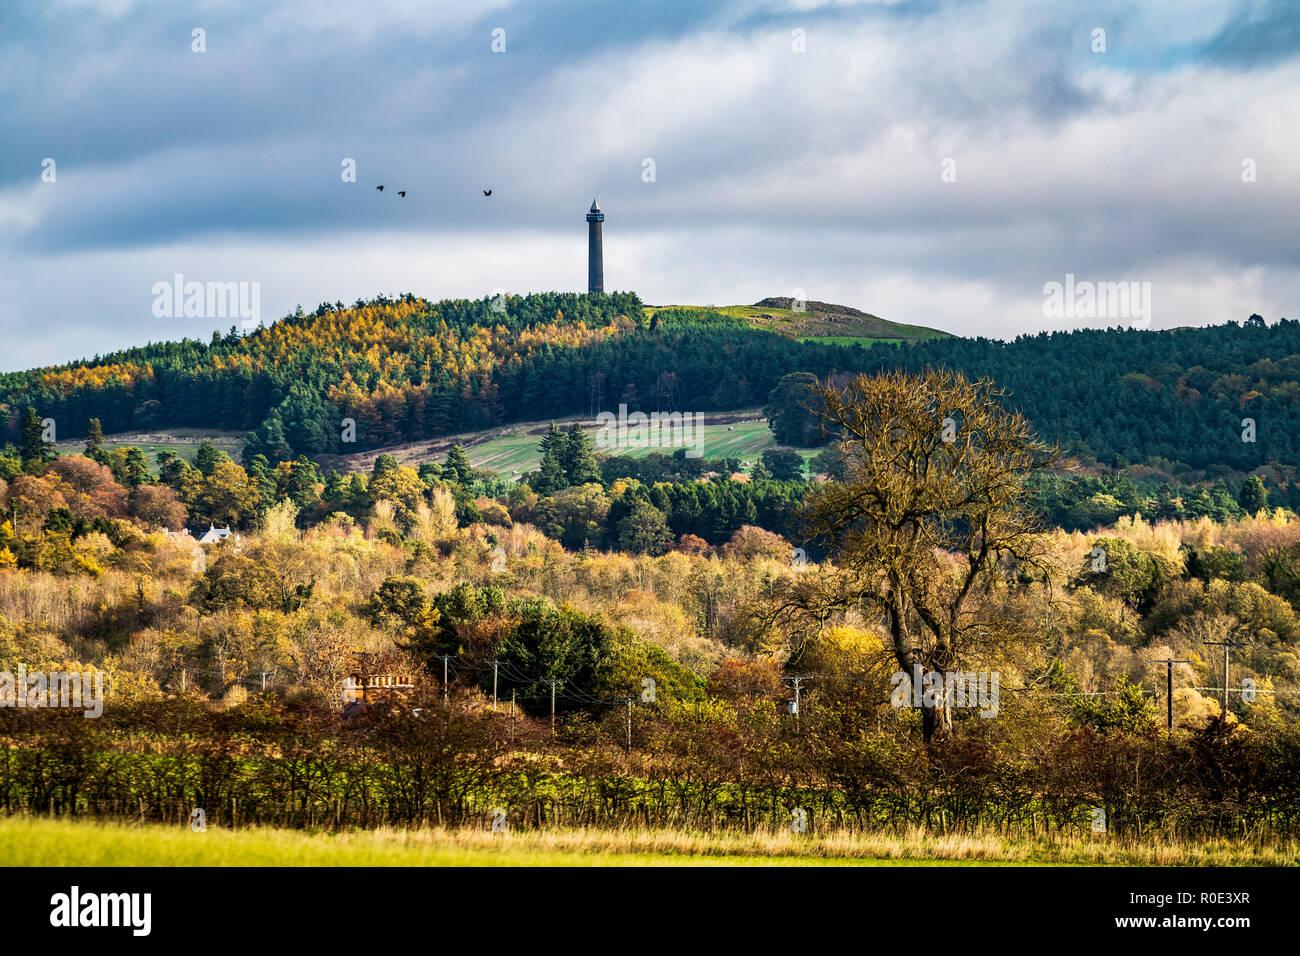 Ancrum, Jedburgh, Scottish Borders, UK. 24th October 2018. The Waterloo Monument, a Borders landmark on the hill Peniel Heugh near Ancrum, stands prou - Stock Image